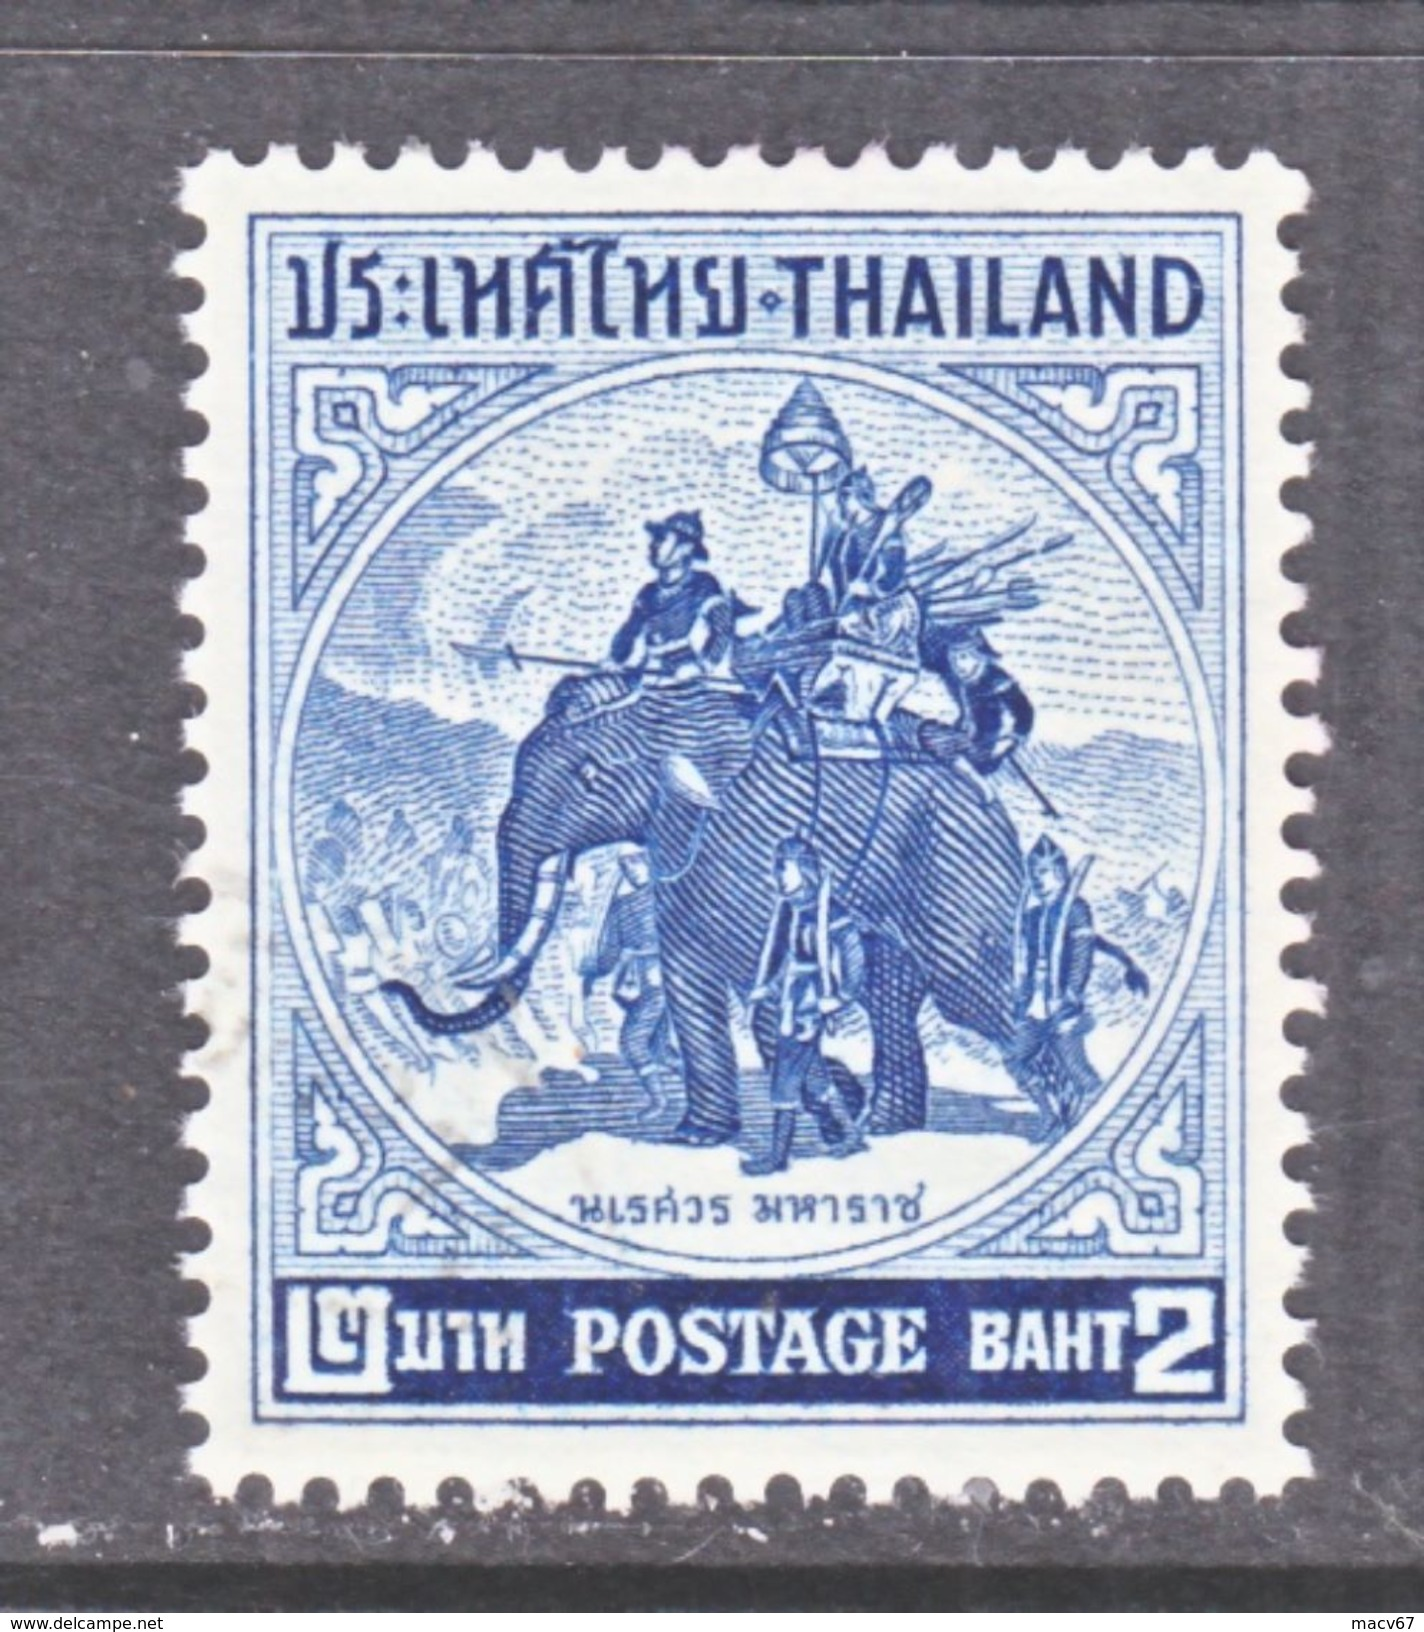 THAILAND  307    (o)  WAR  ELEPHANT - Thailand